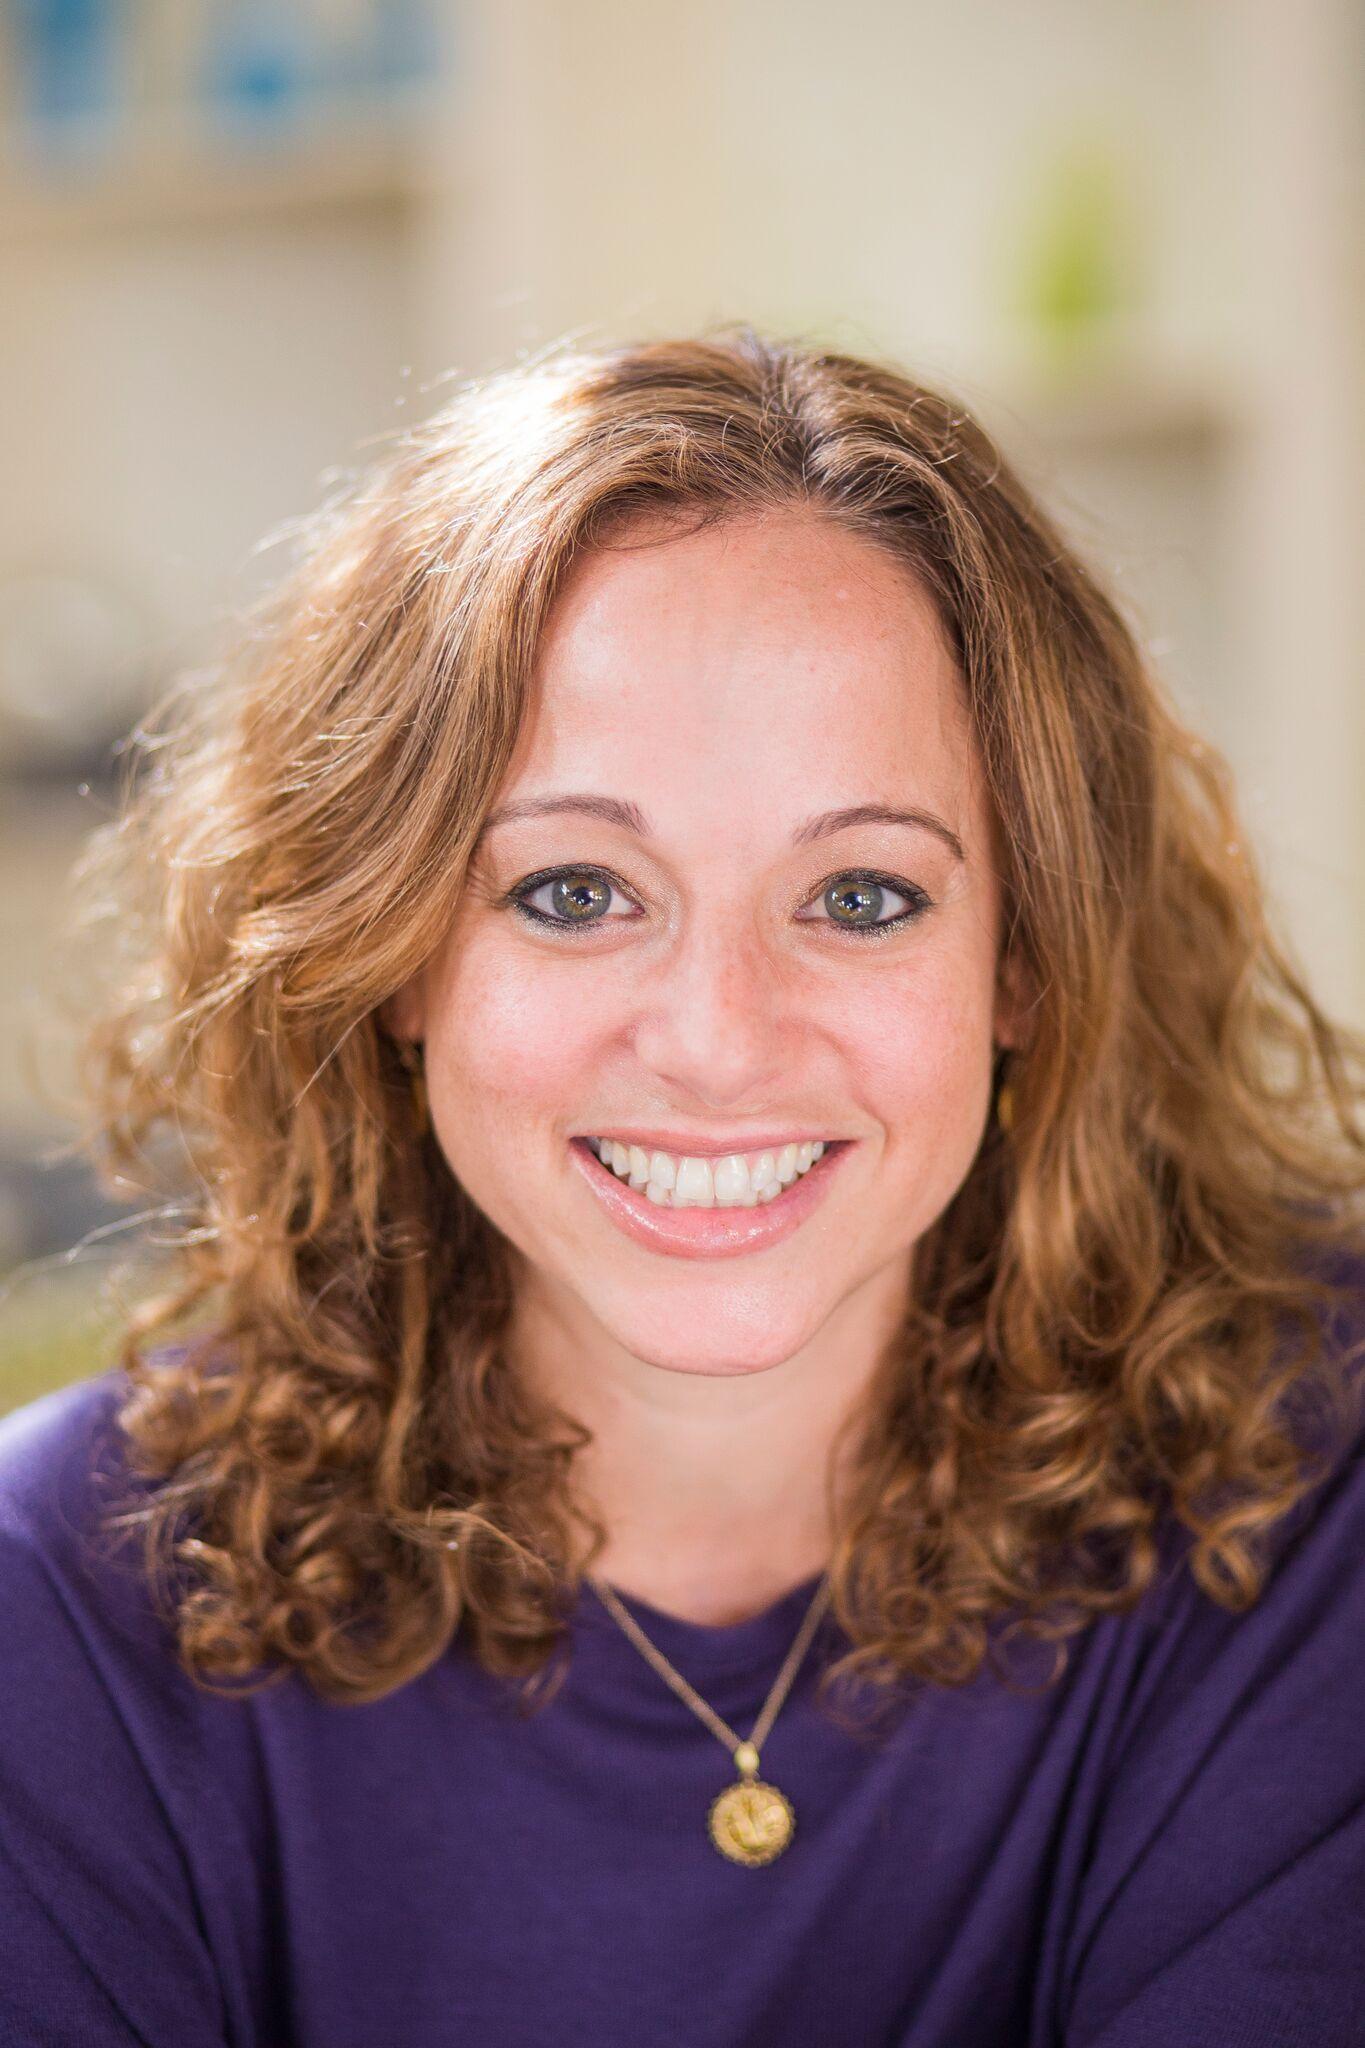 Linda Novick O'Keefe Headshot - Dennis Burnett Photography - Lauren Salkeld